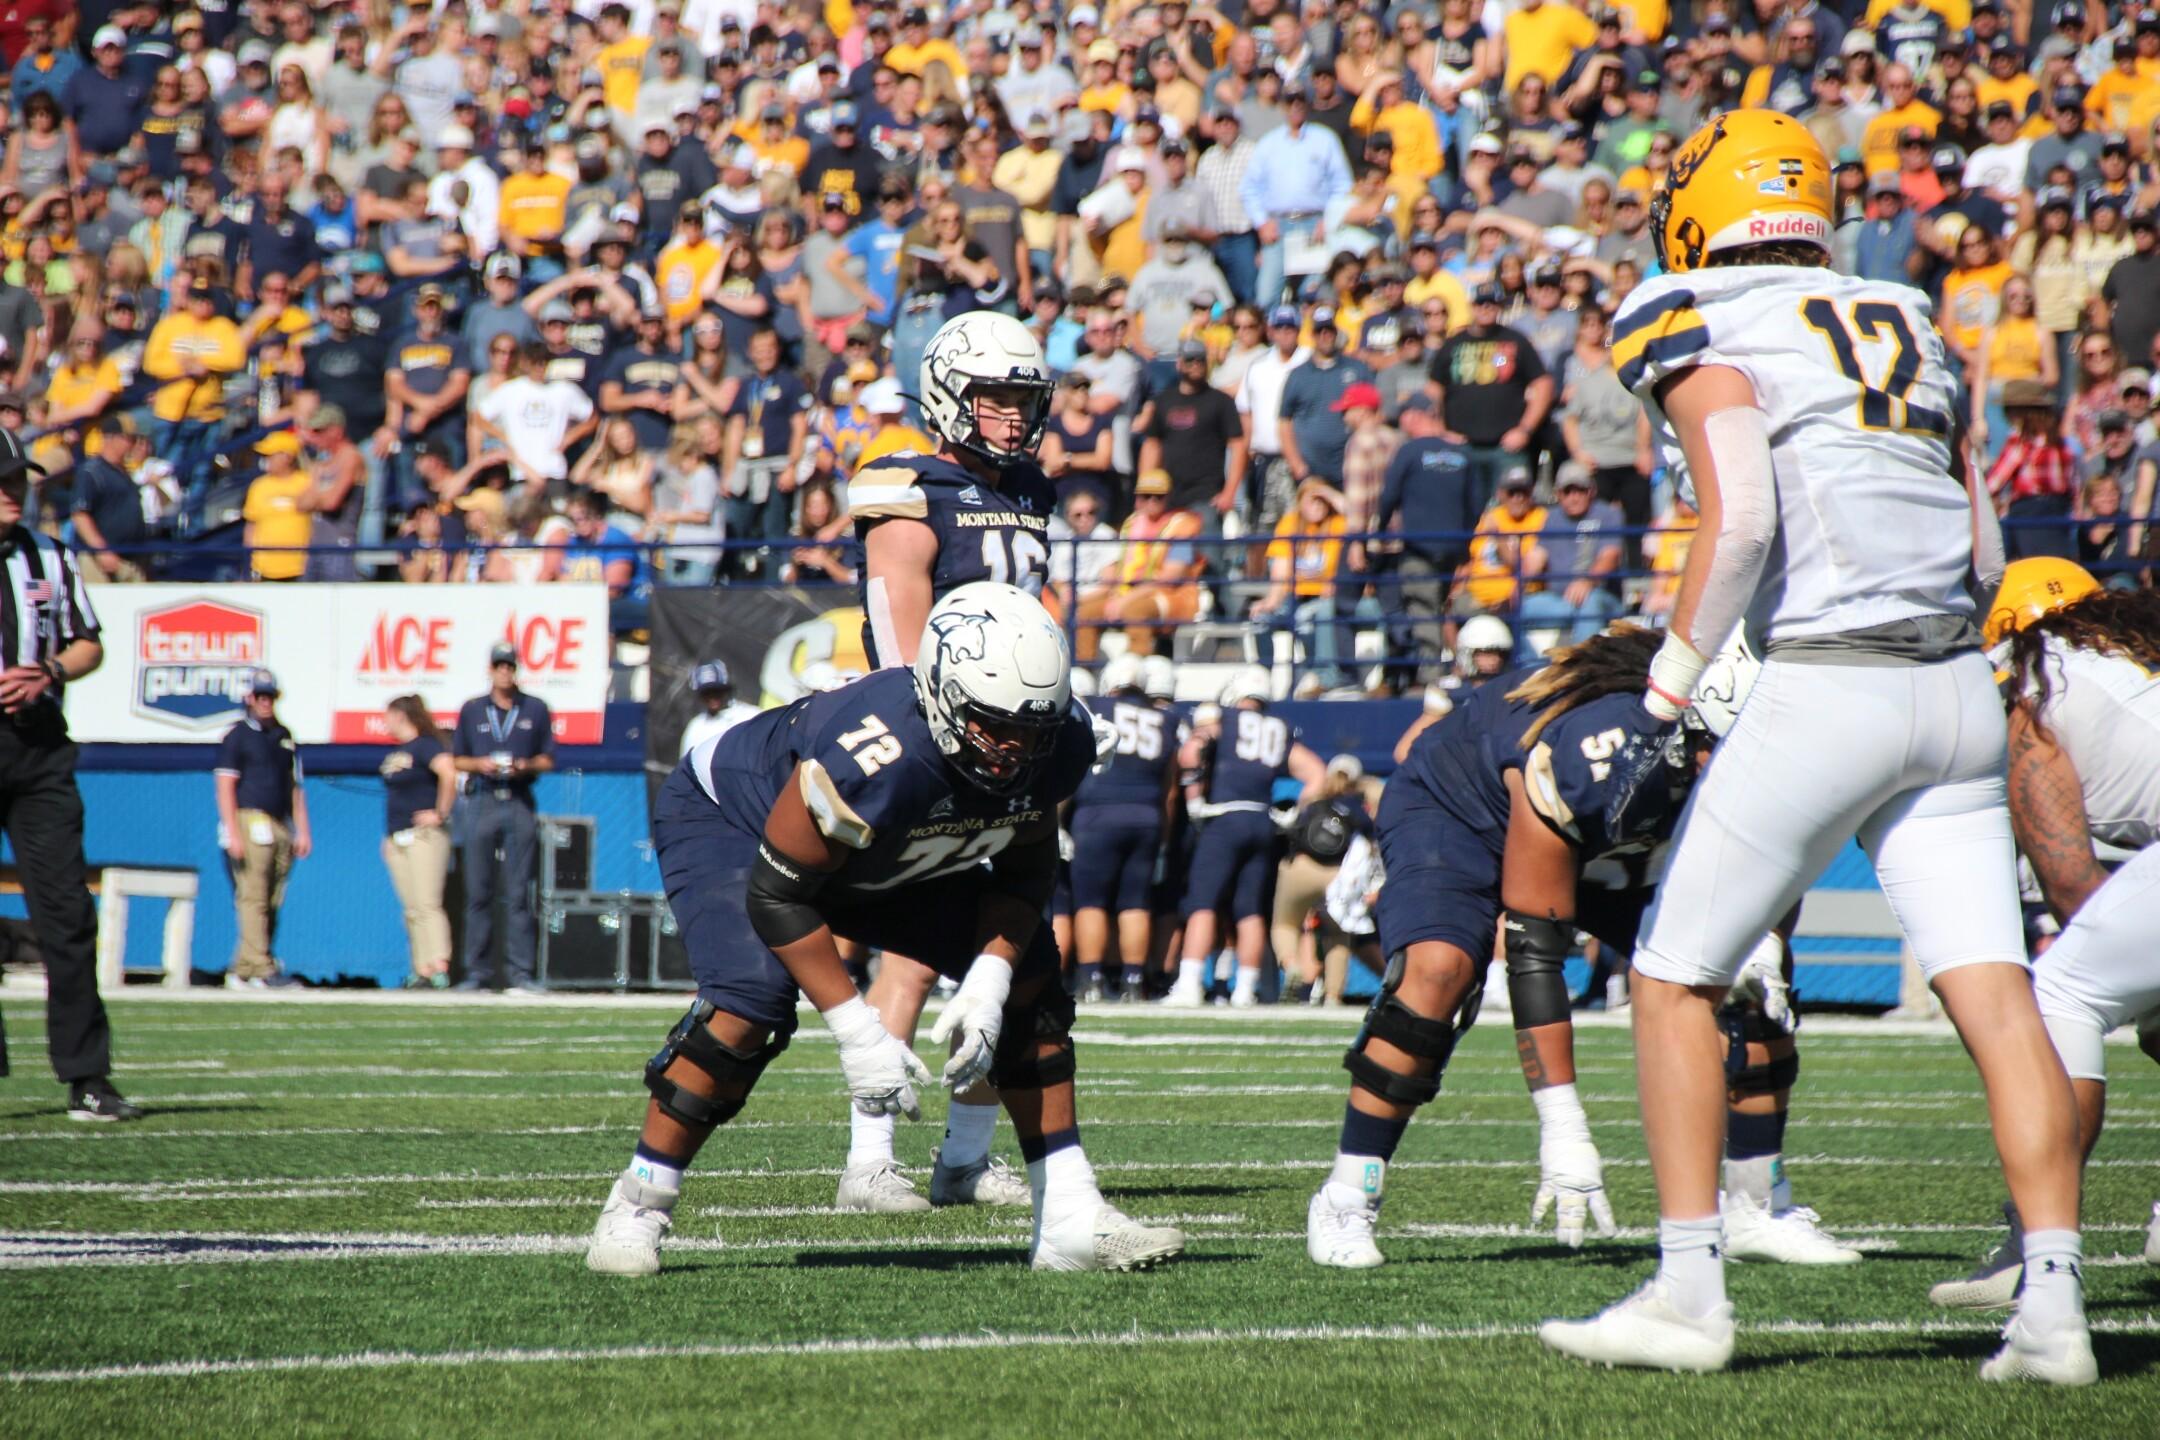 Tommy Mellot takes a snap at quarterback